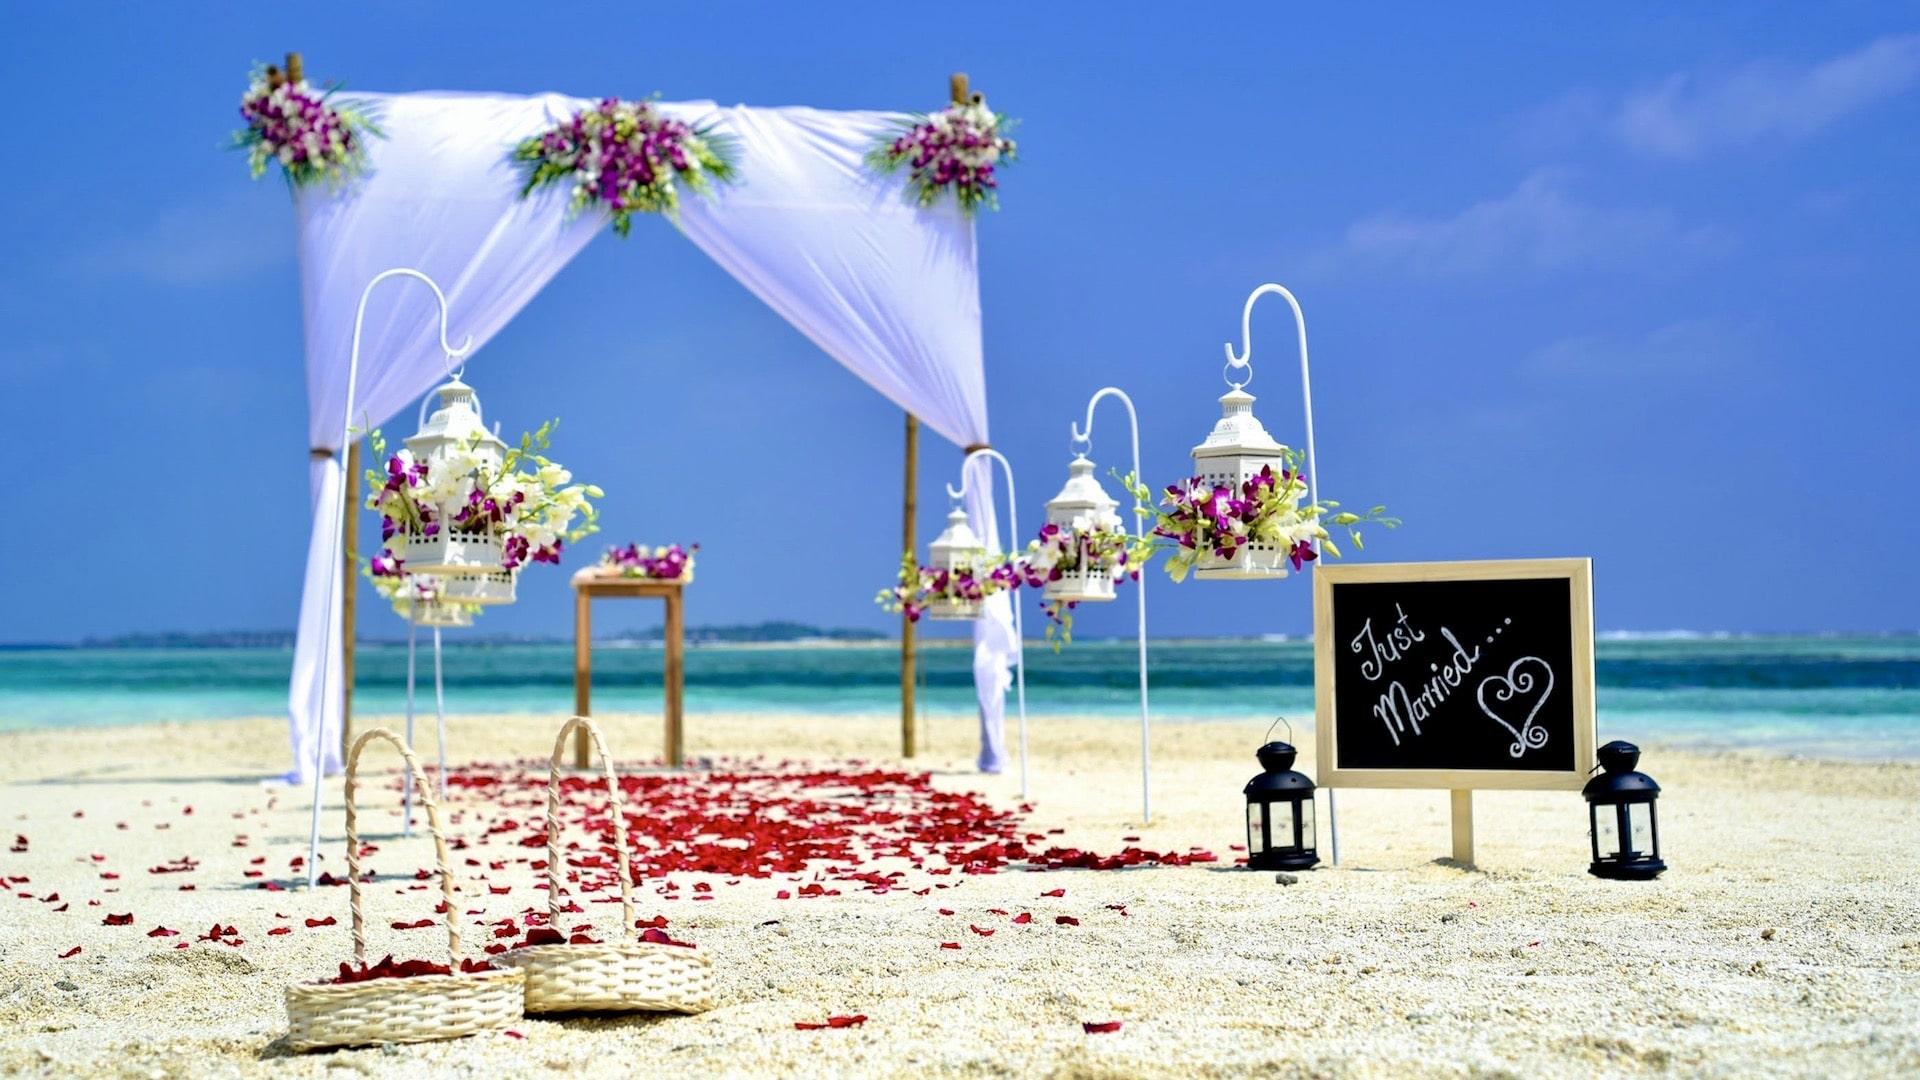 Beach Wedding - Just Married